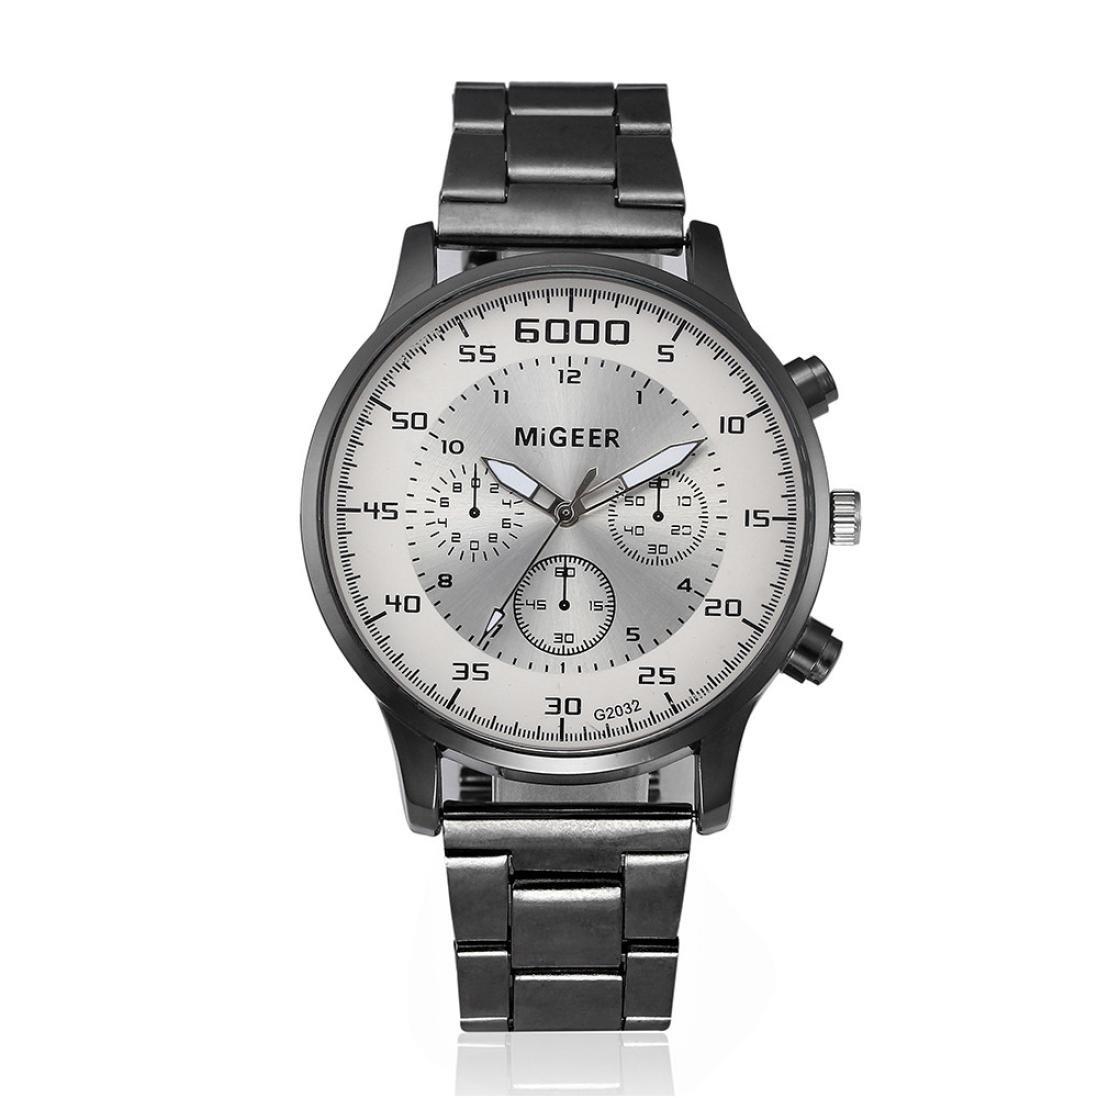 Amazon.com: Auwer Watch, Mens Watches, Fashion Men Crystal Stainless Steel Analog Quartz Wrist Watch Bracelet (White): Watches